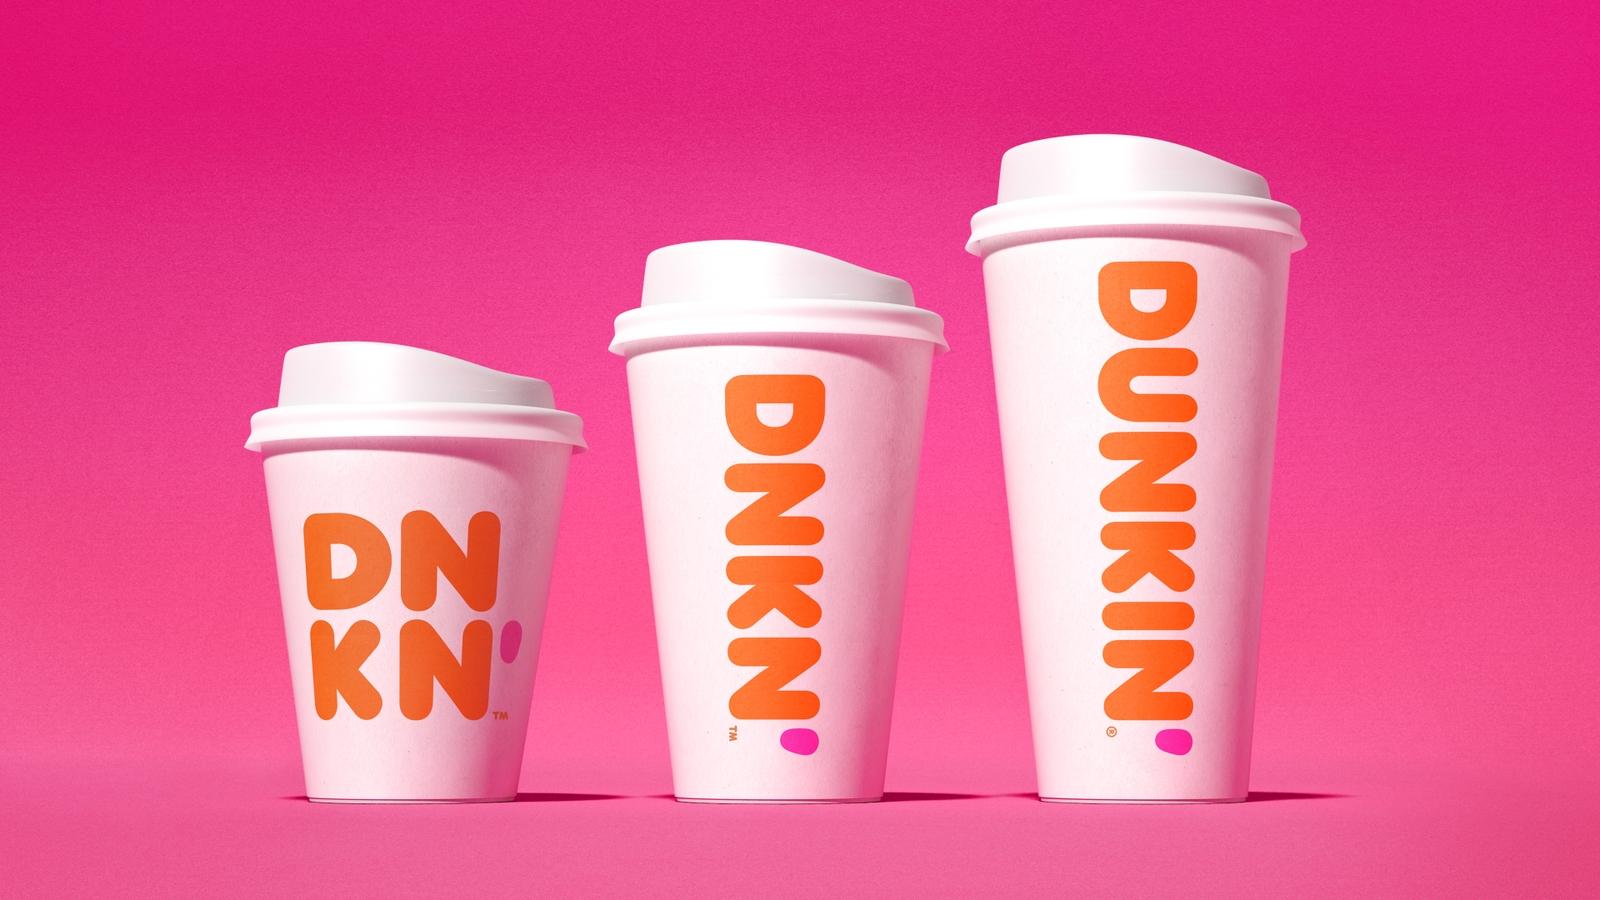 Dunkin' Hot Coffee Lineup